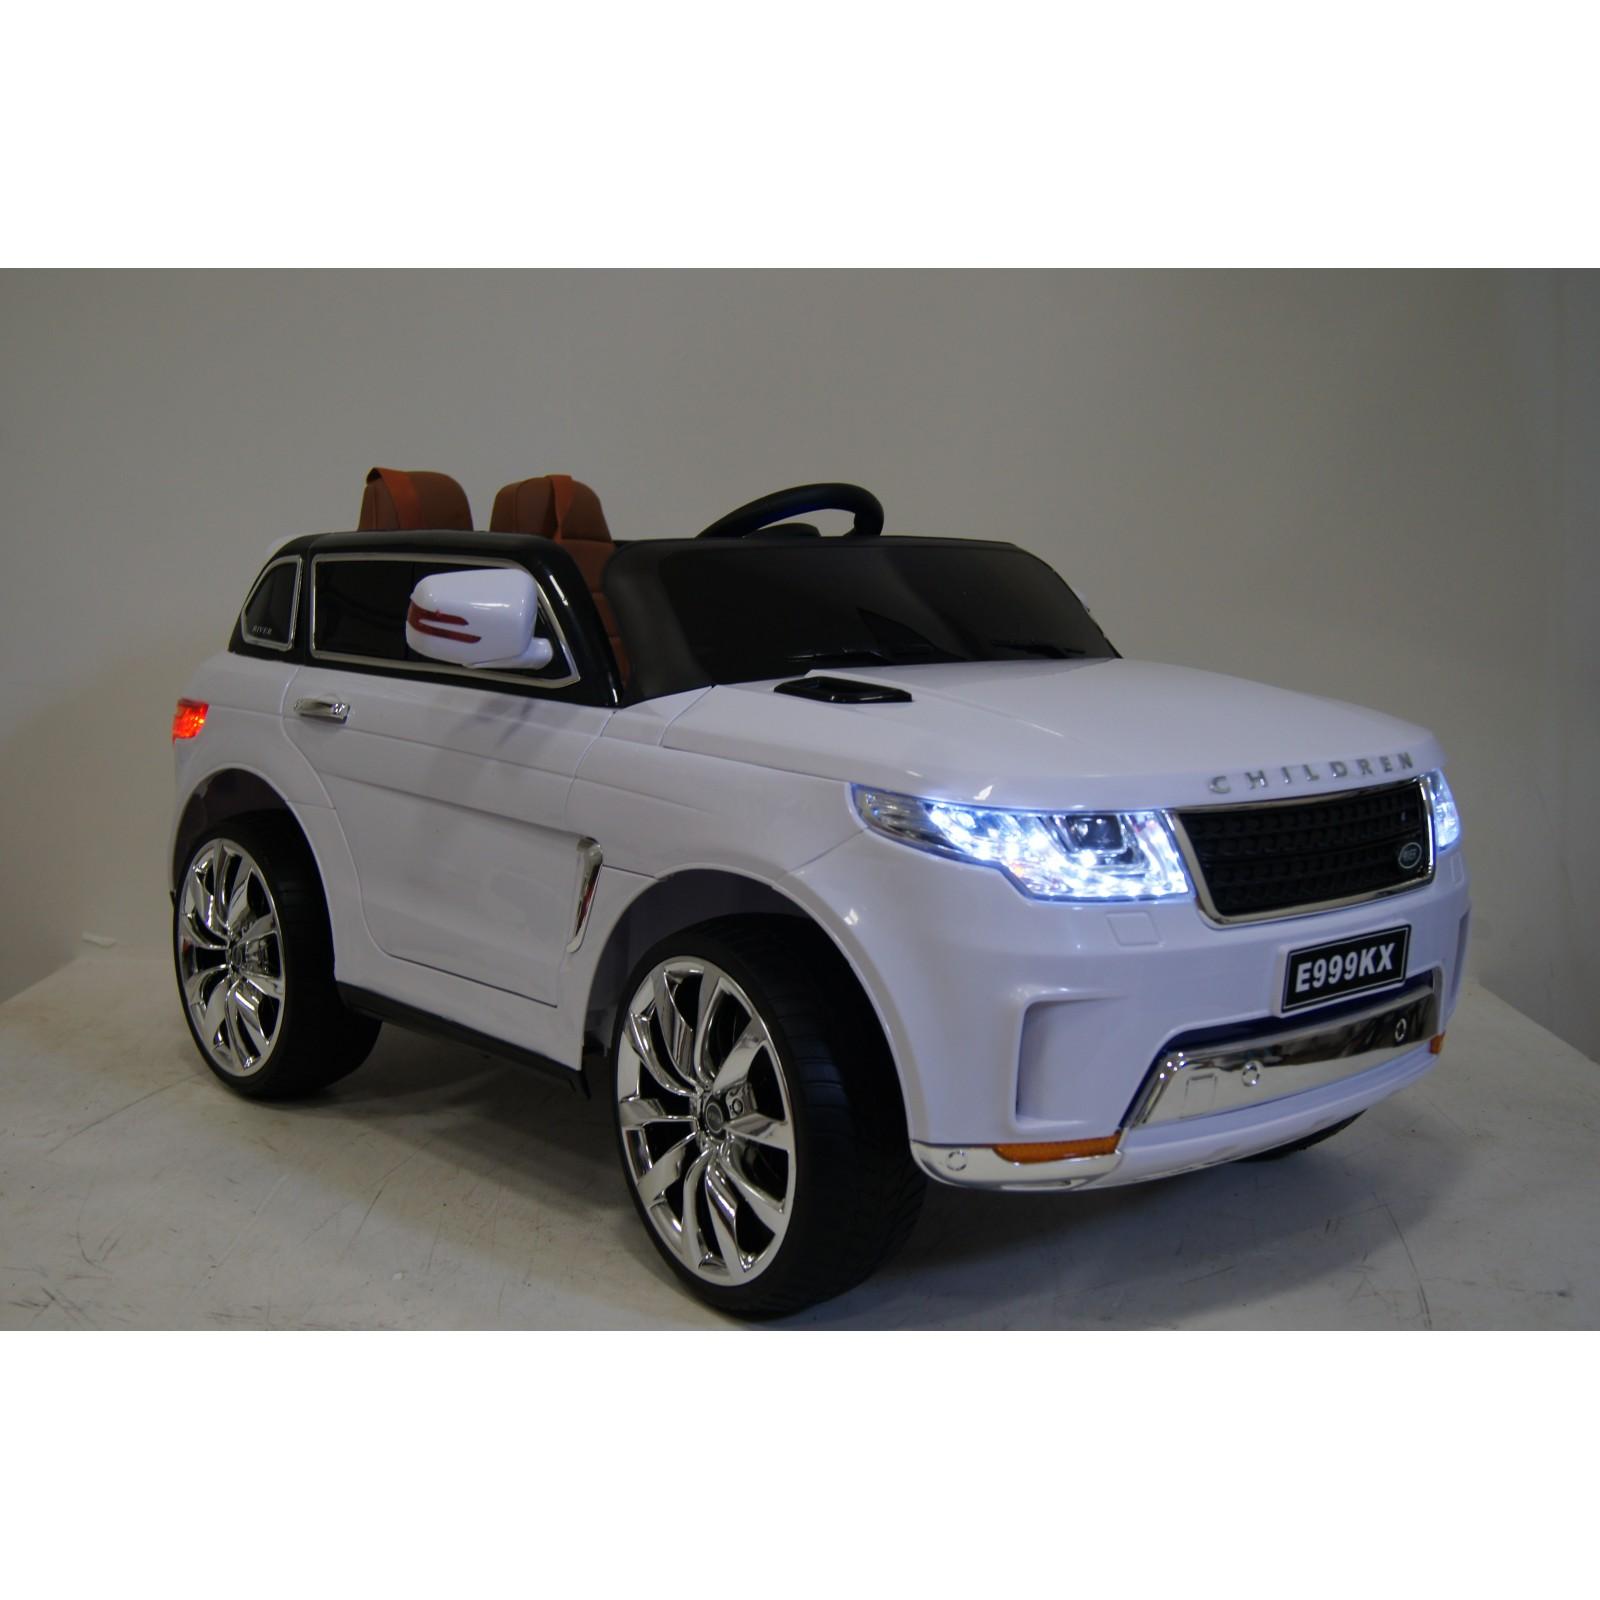 Детский электромобиль RANGE-ROVER SPORT (E999KX)